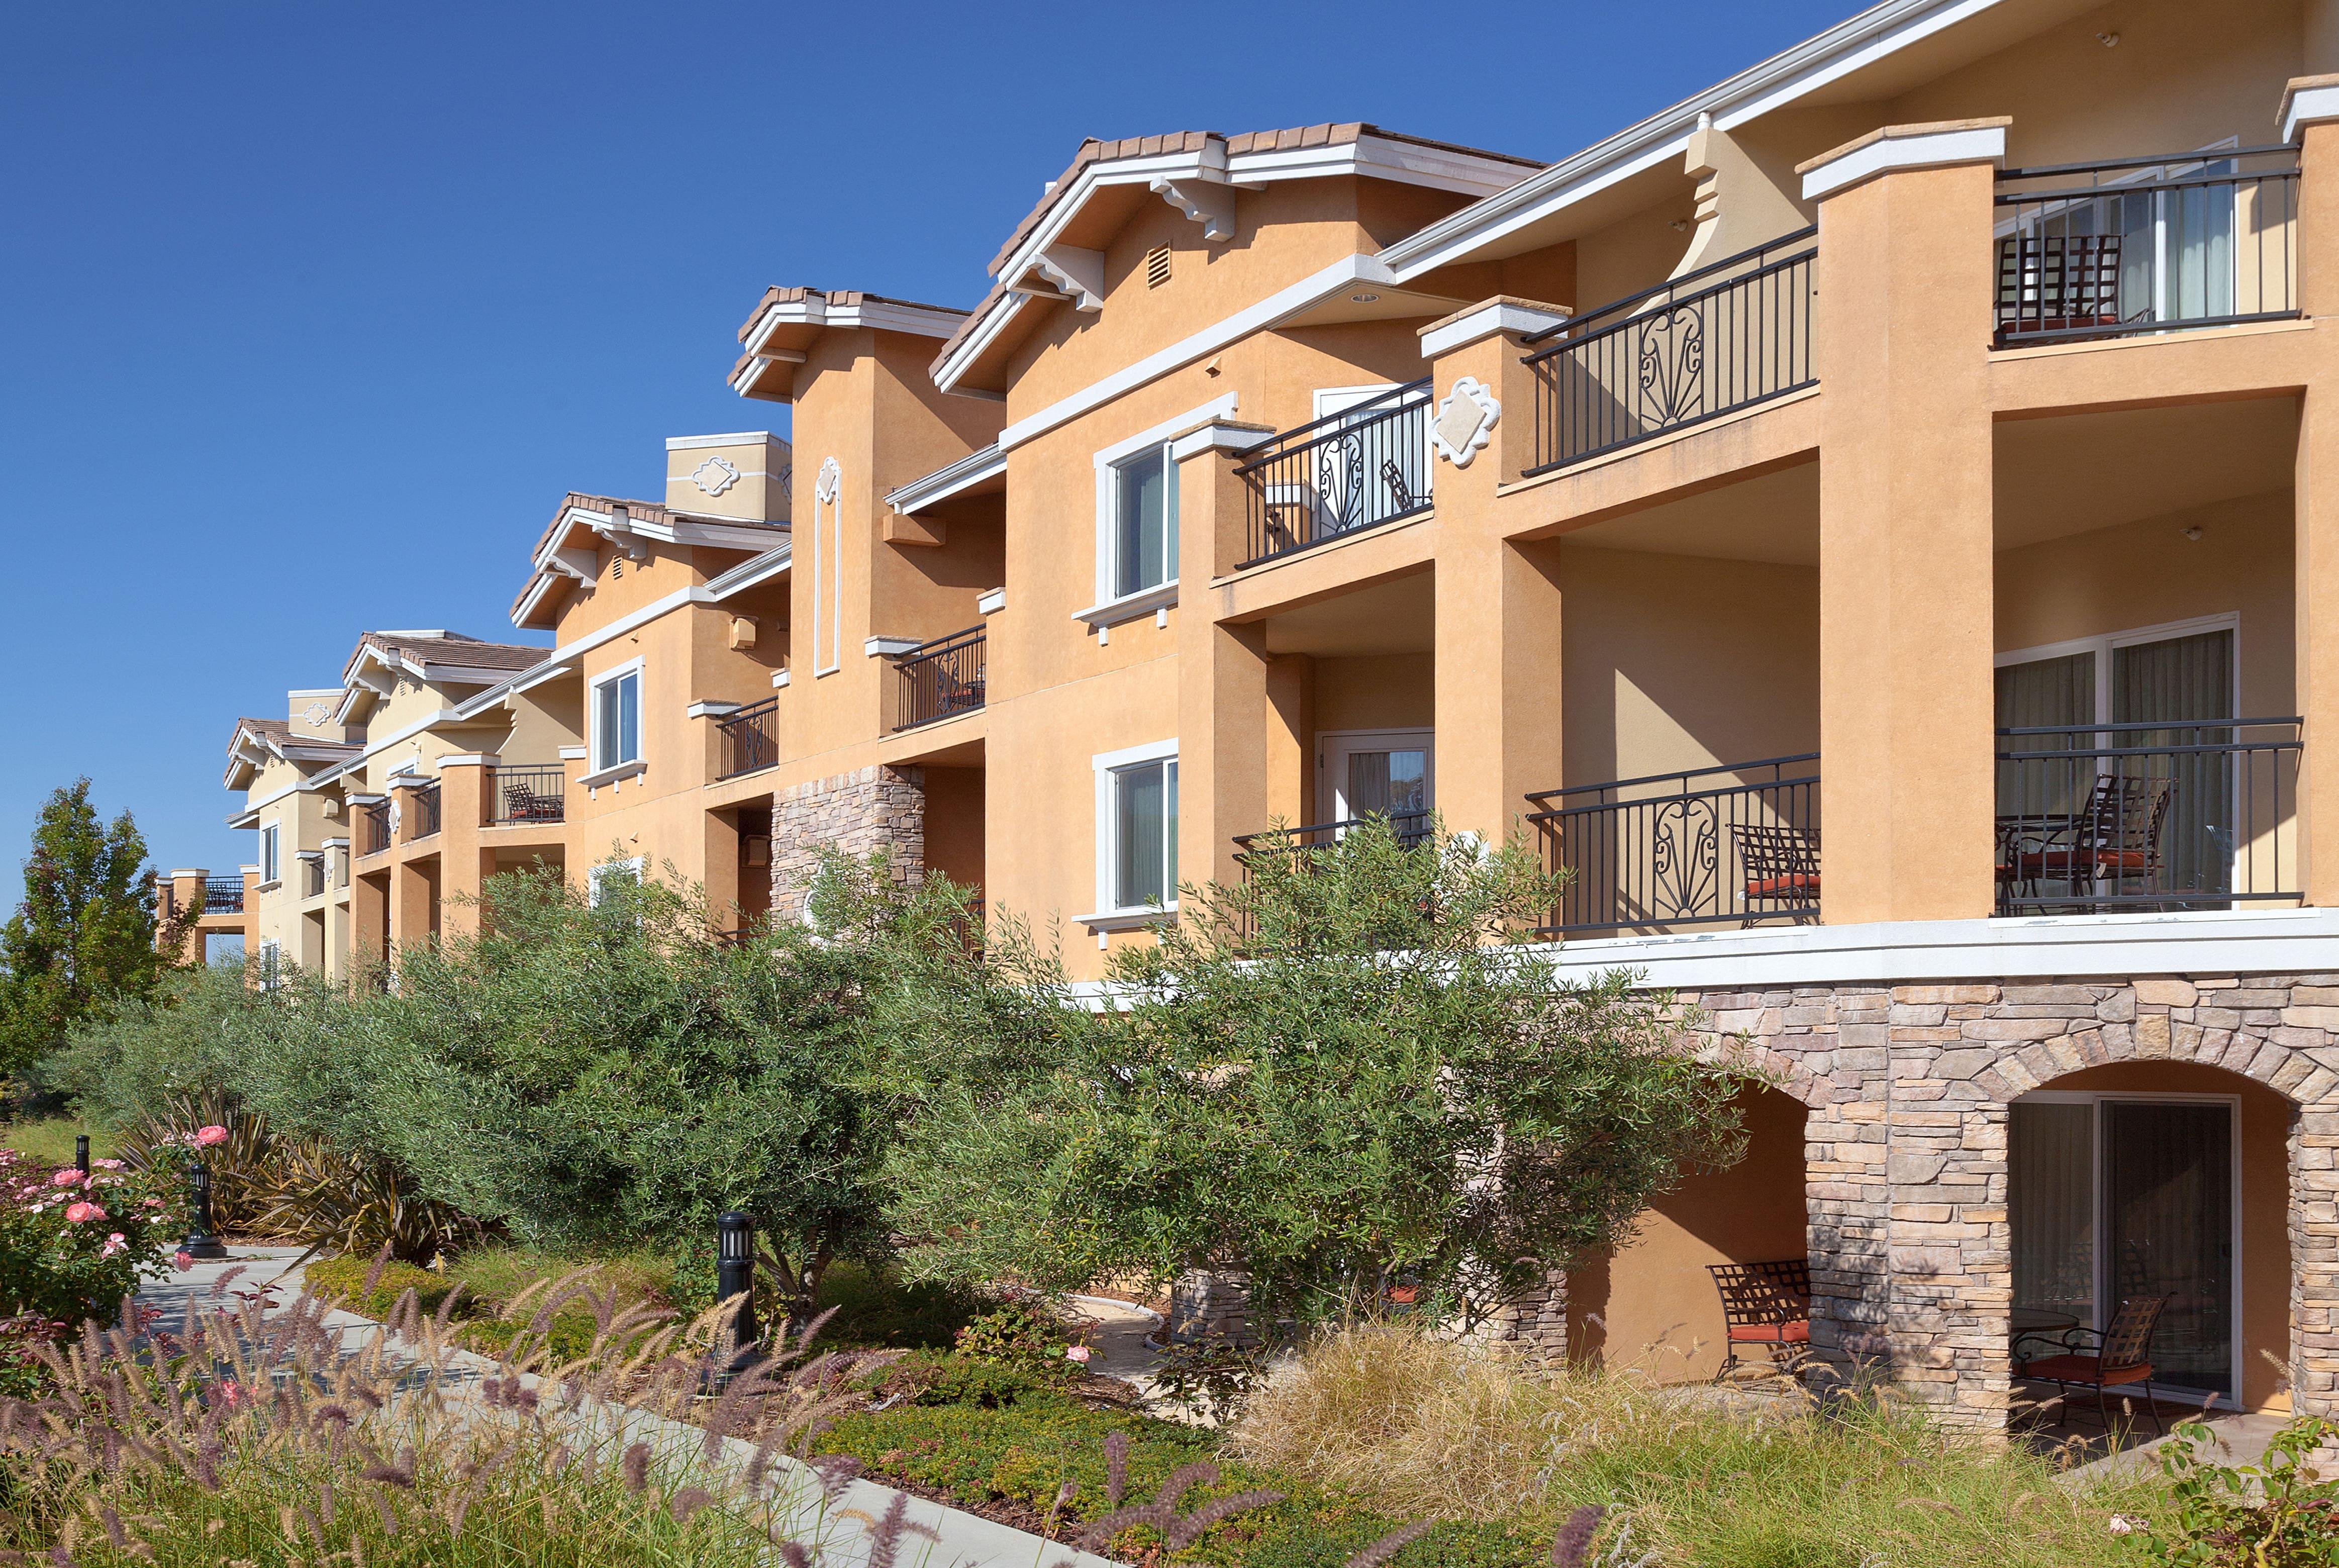 Vino Bello Resort In Rohnert Park California With Hotels